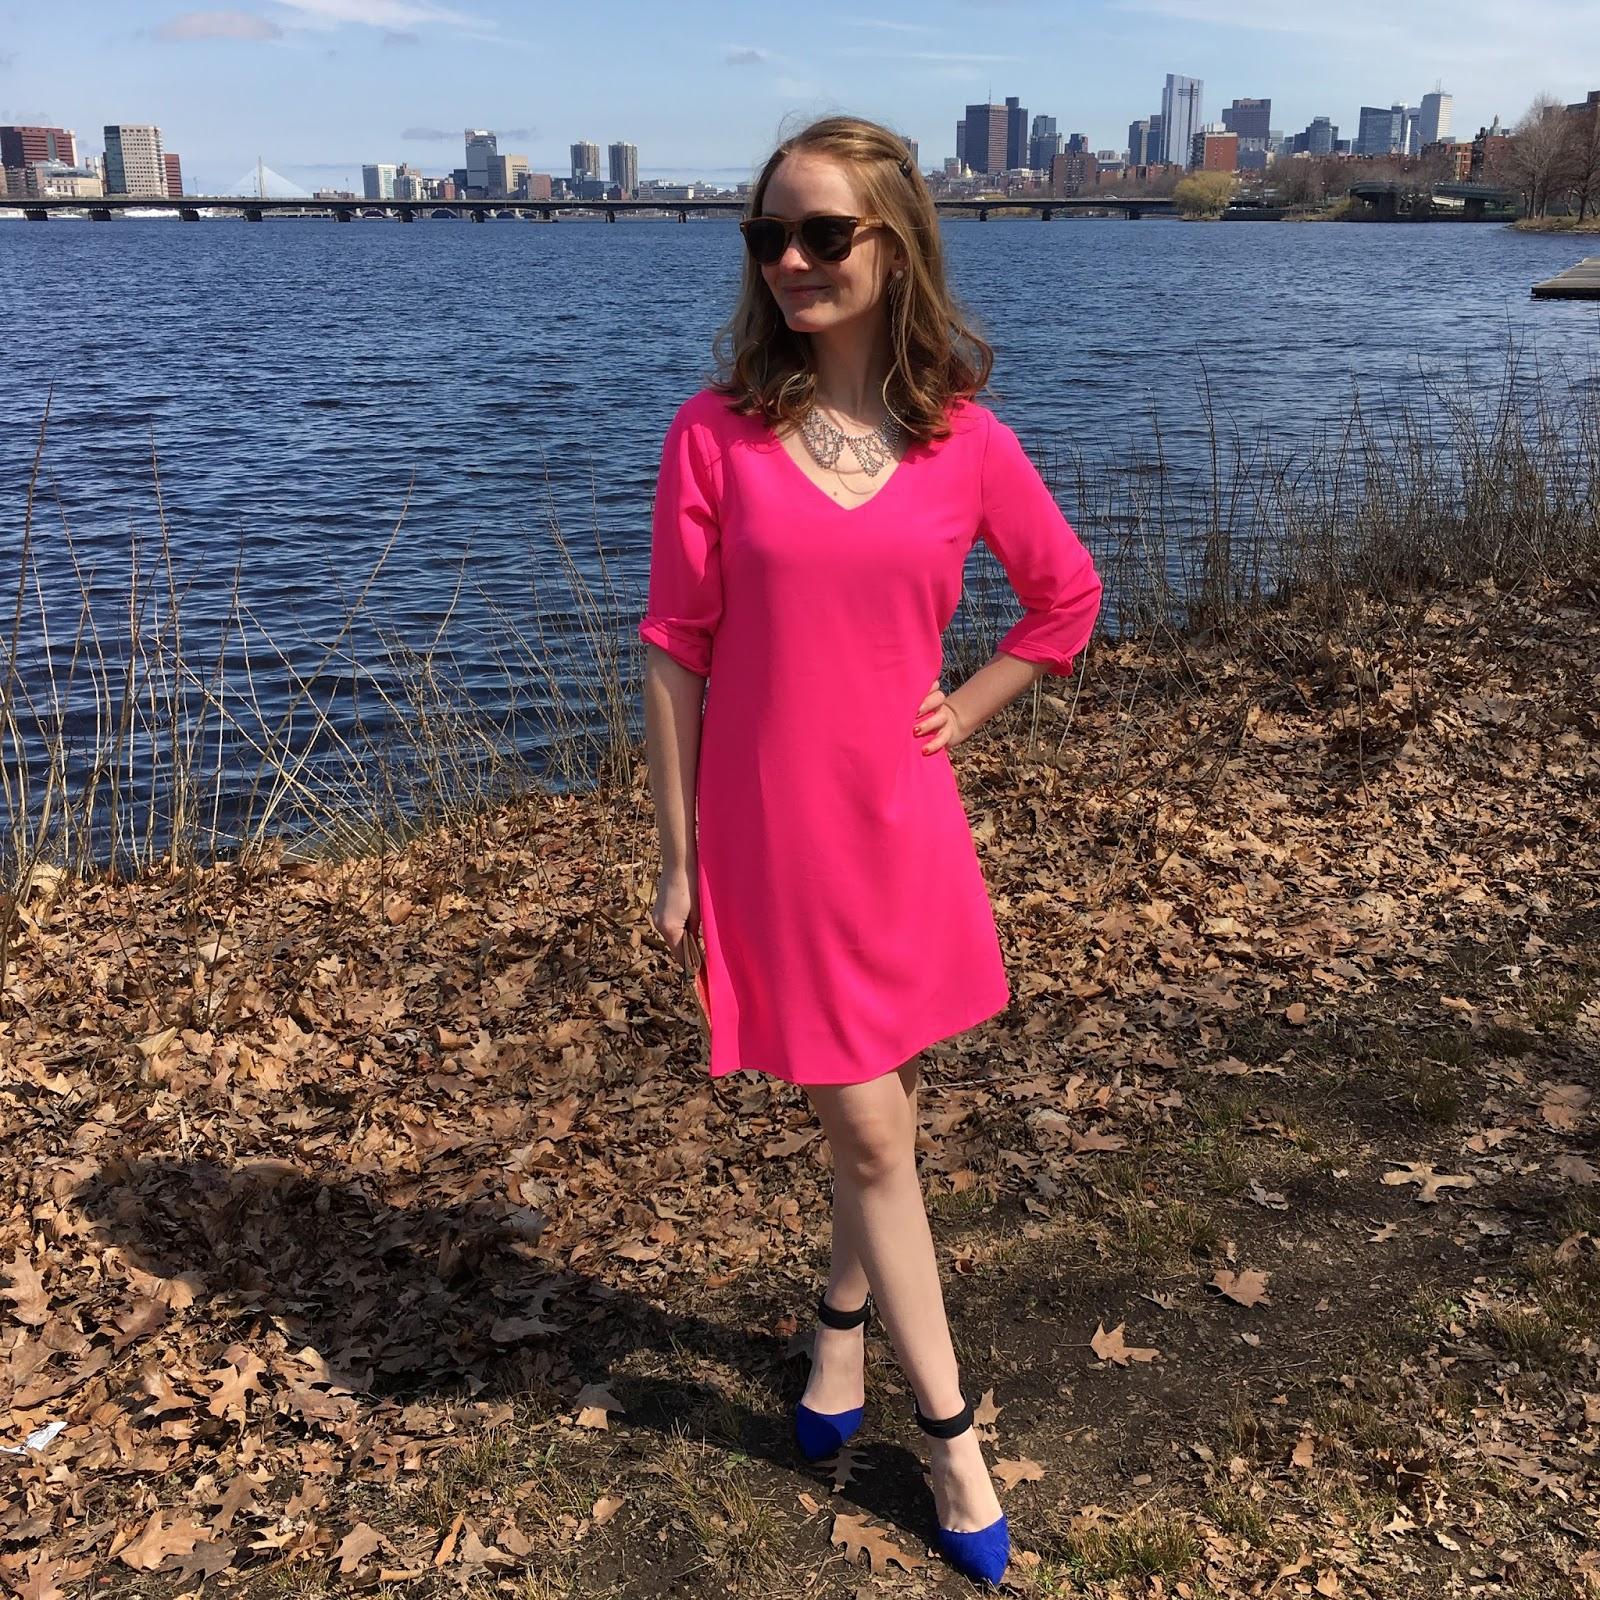 Dress: c/o The Mint Julep Boutique   Heels: Target   Necklace: c/o Rocksbox   Clutch: Fossil